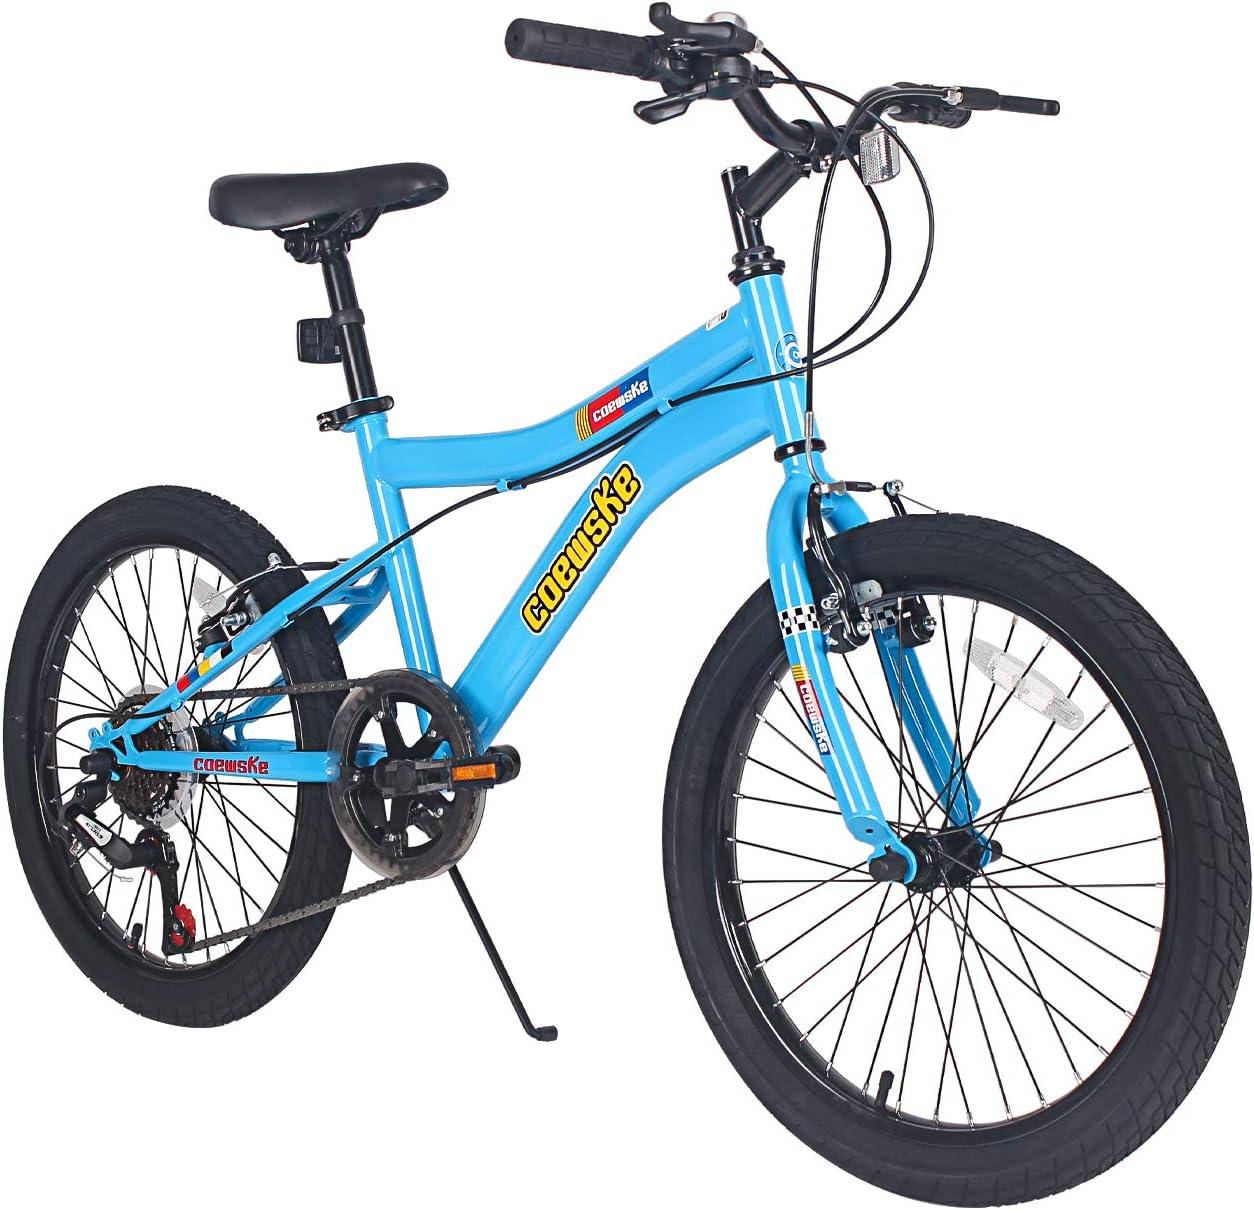 "Blue Color Brand New.FAST SHIP BCA 20/"" Boy/'s Mountain Bike"